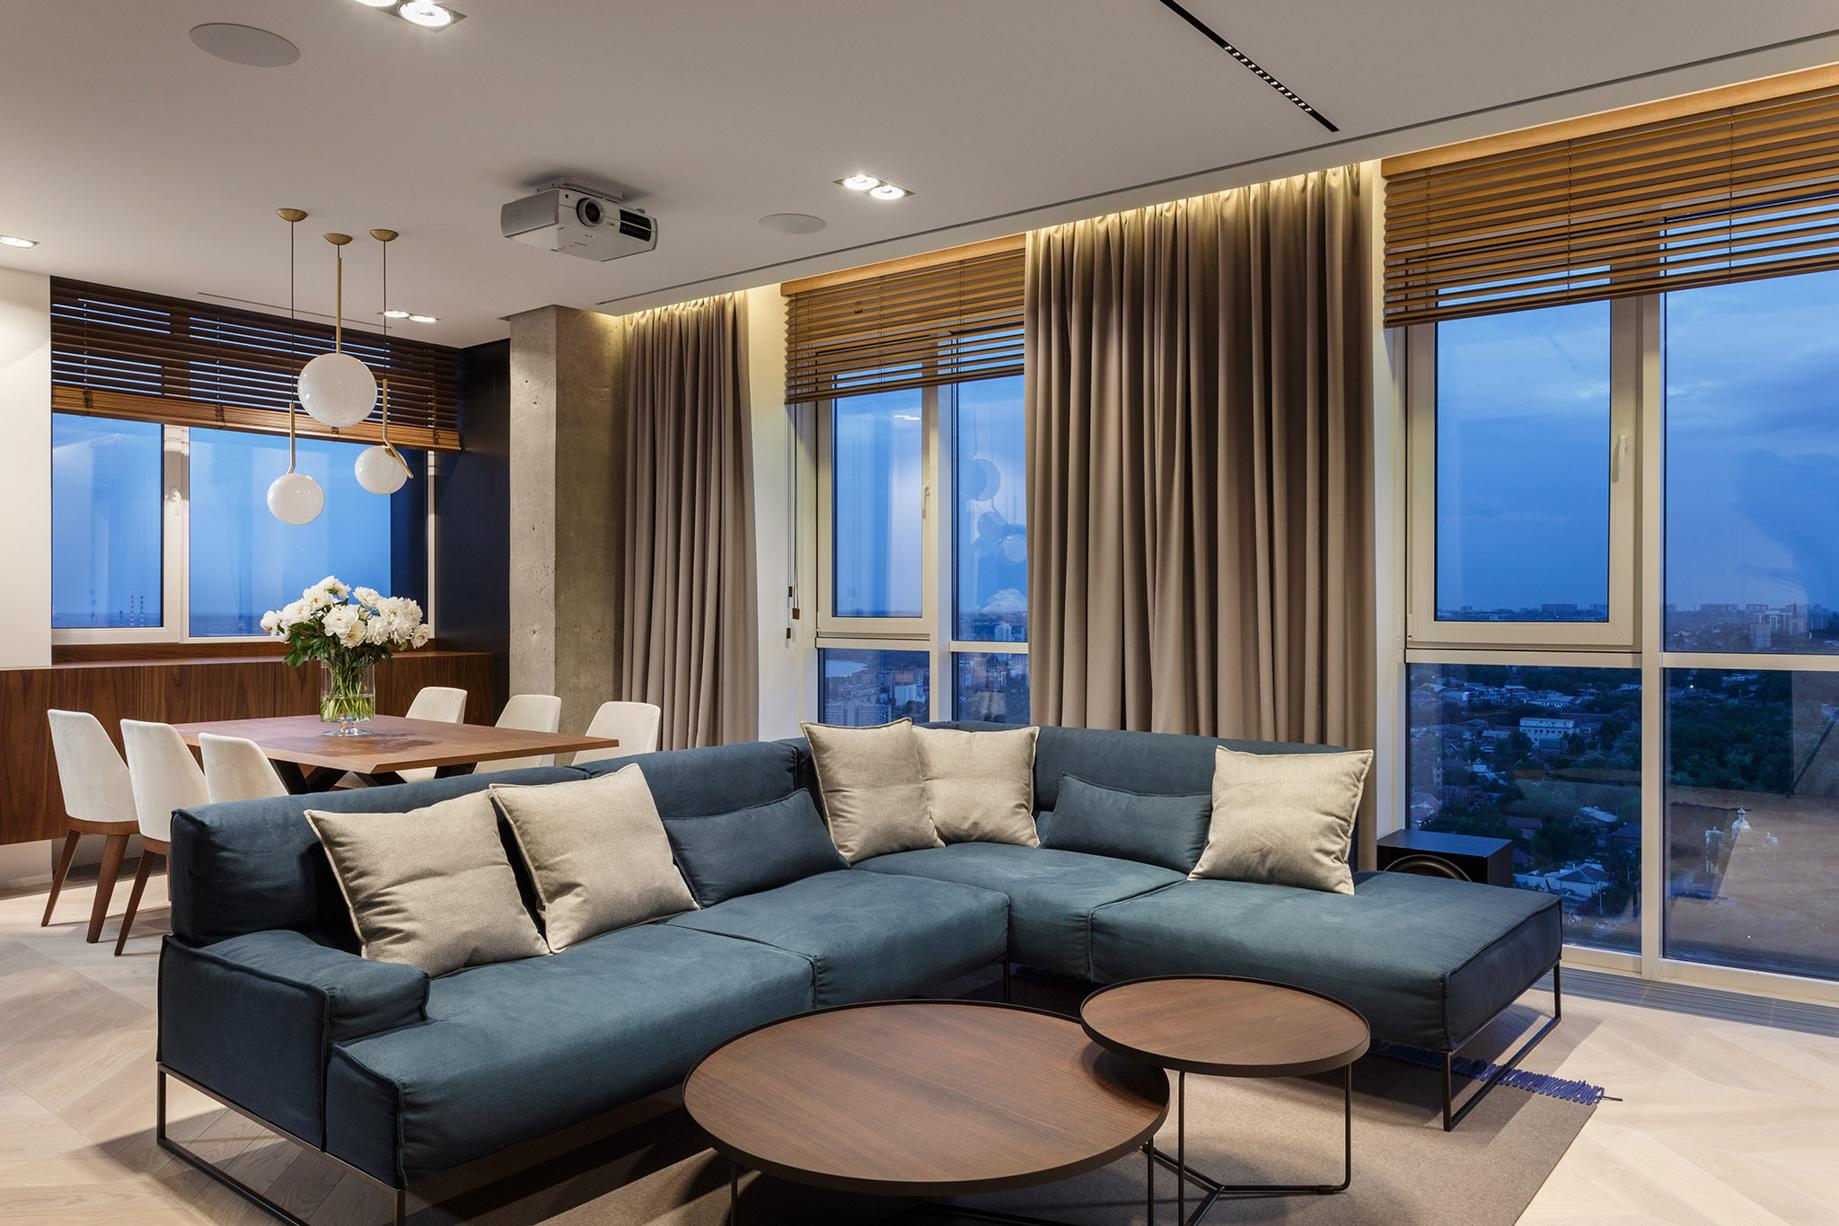 River View Apartment Interior Design Dnipro, Ukraine – Svoya Studio